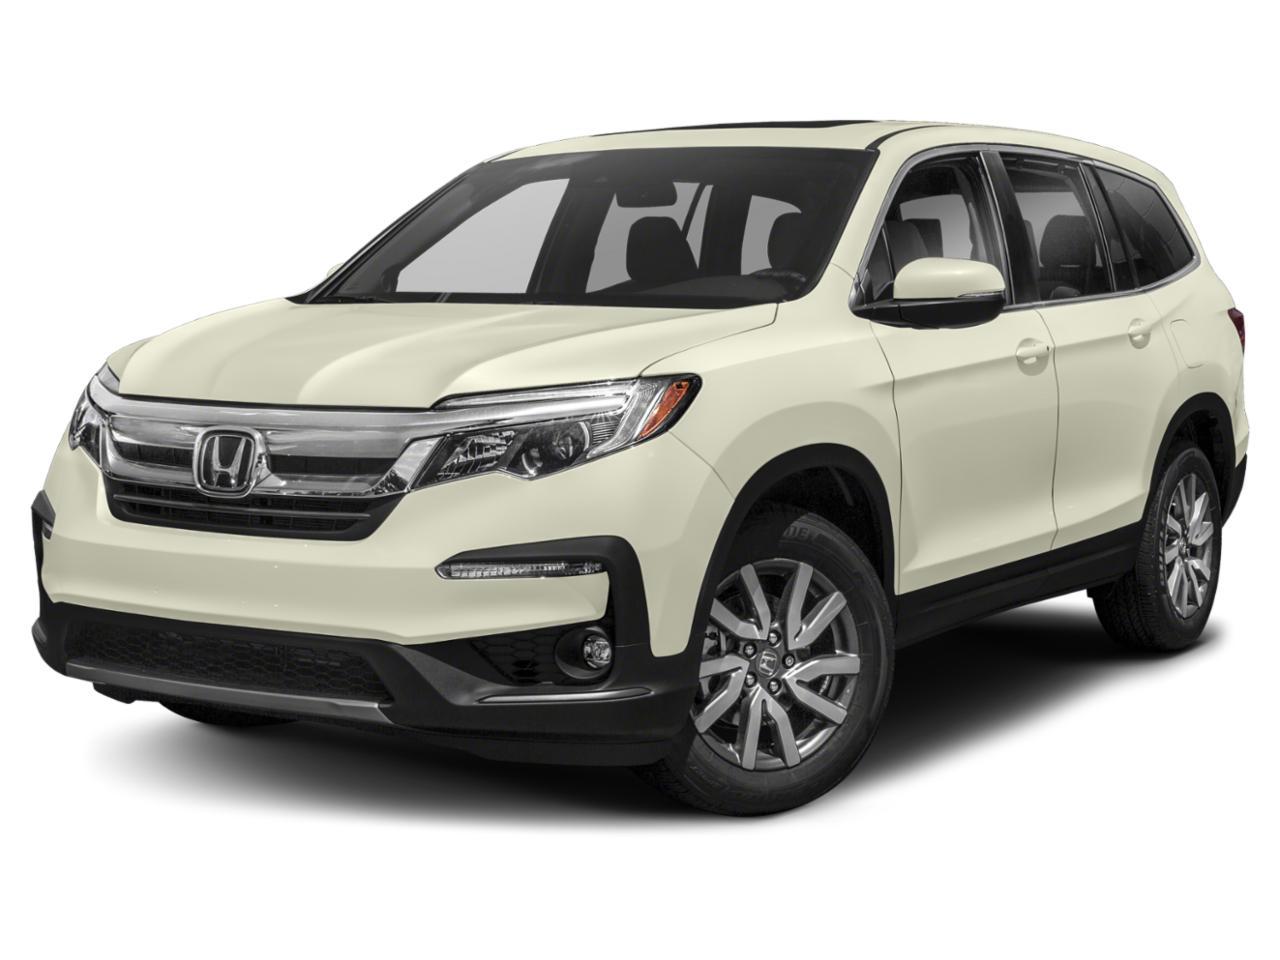 2019 Honda Pilot Vehicle Photo in Grapevine, TX 76051